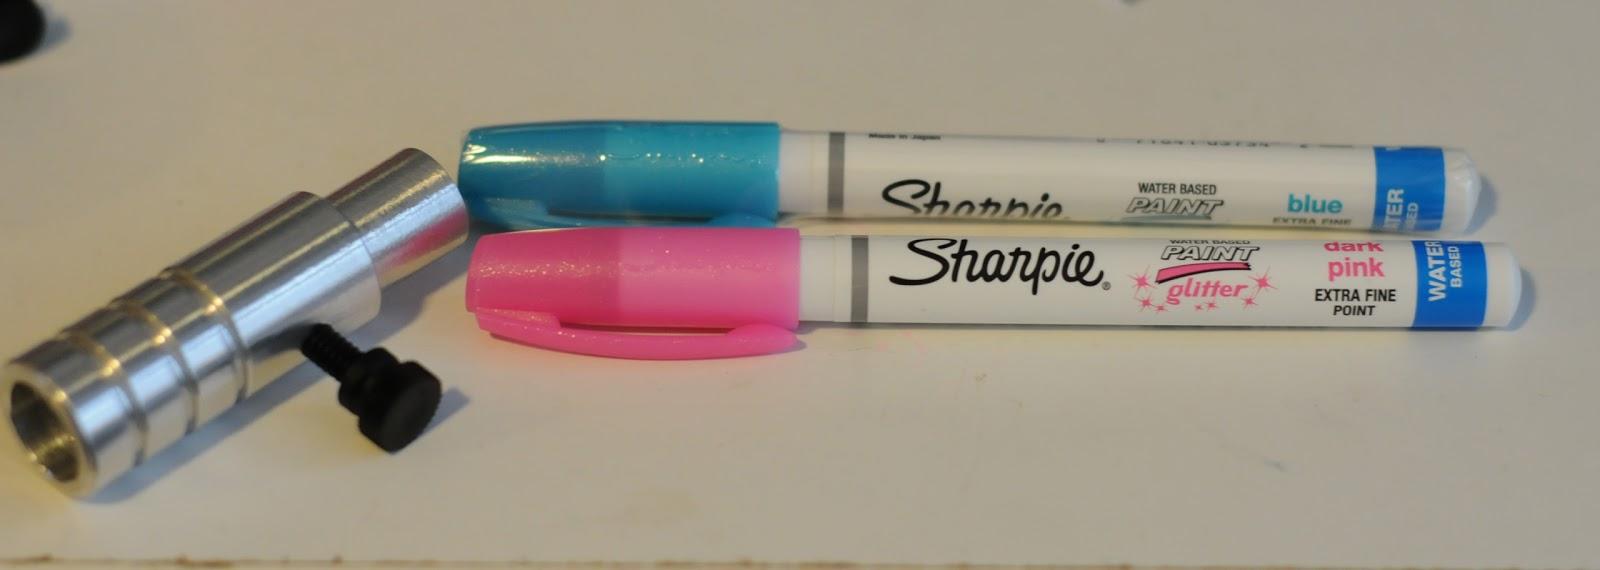 How to use cricut paint pens